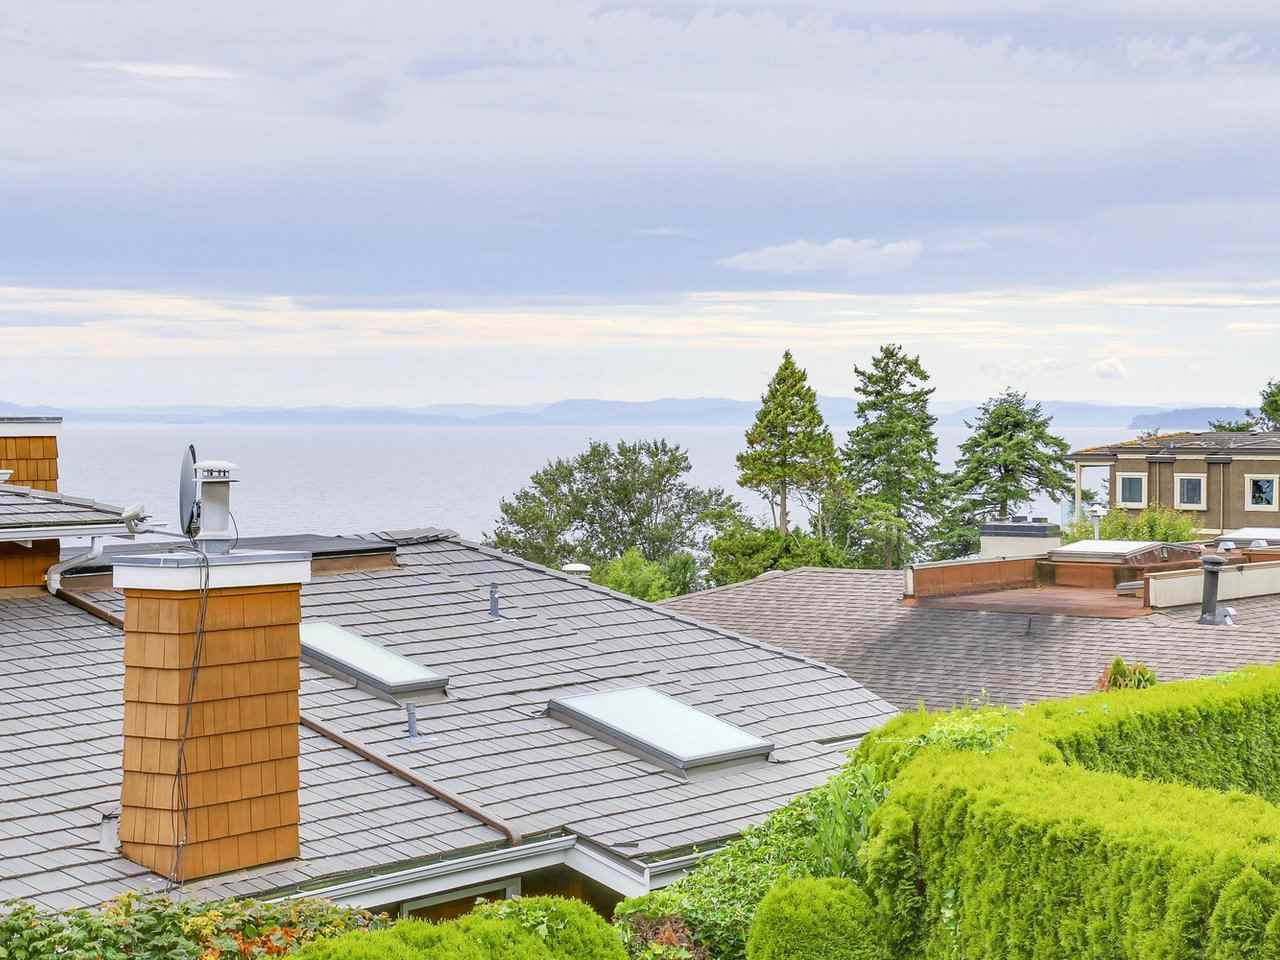 Detached at 1325 132B STREET, South Surrey White Rock, British Columbia. Image 11